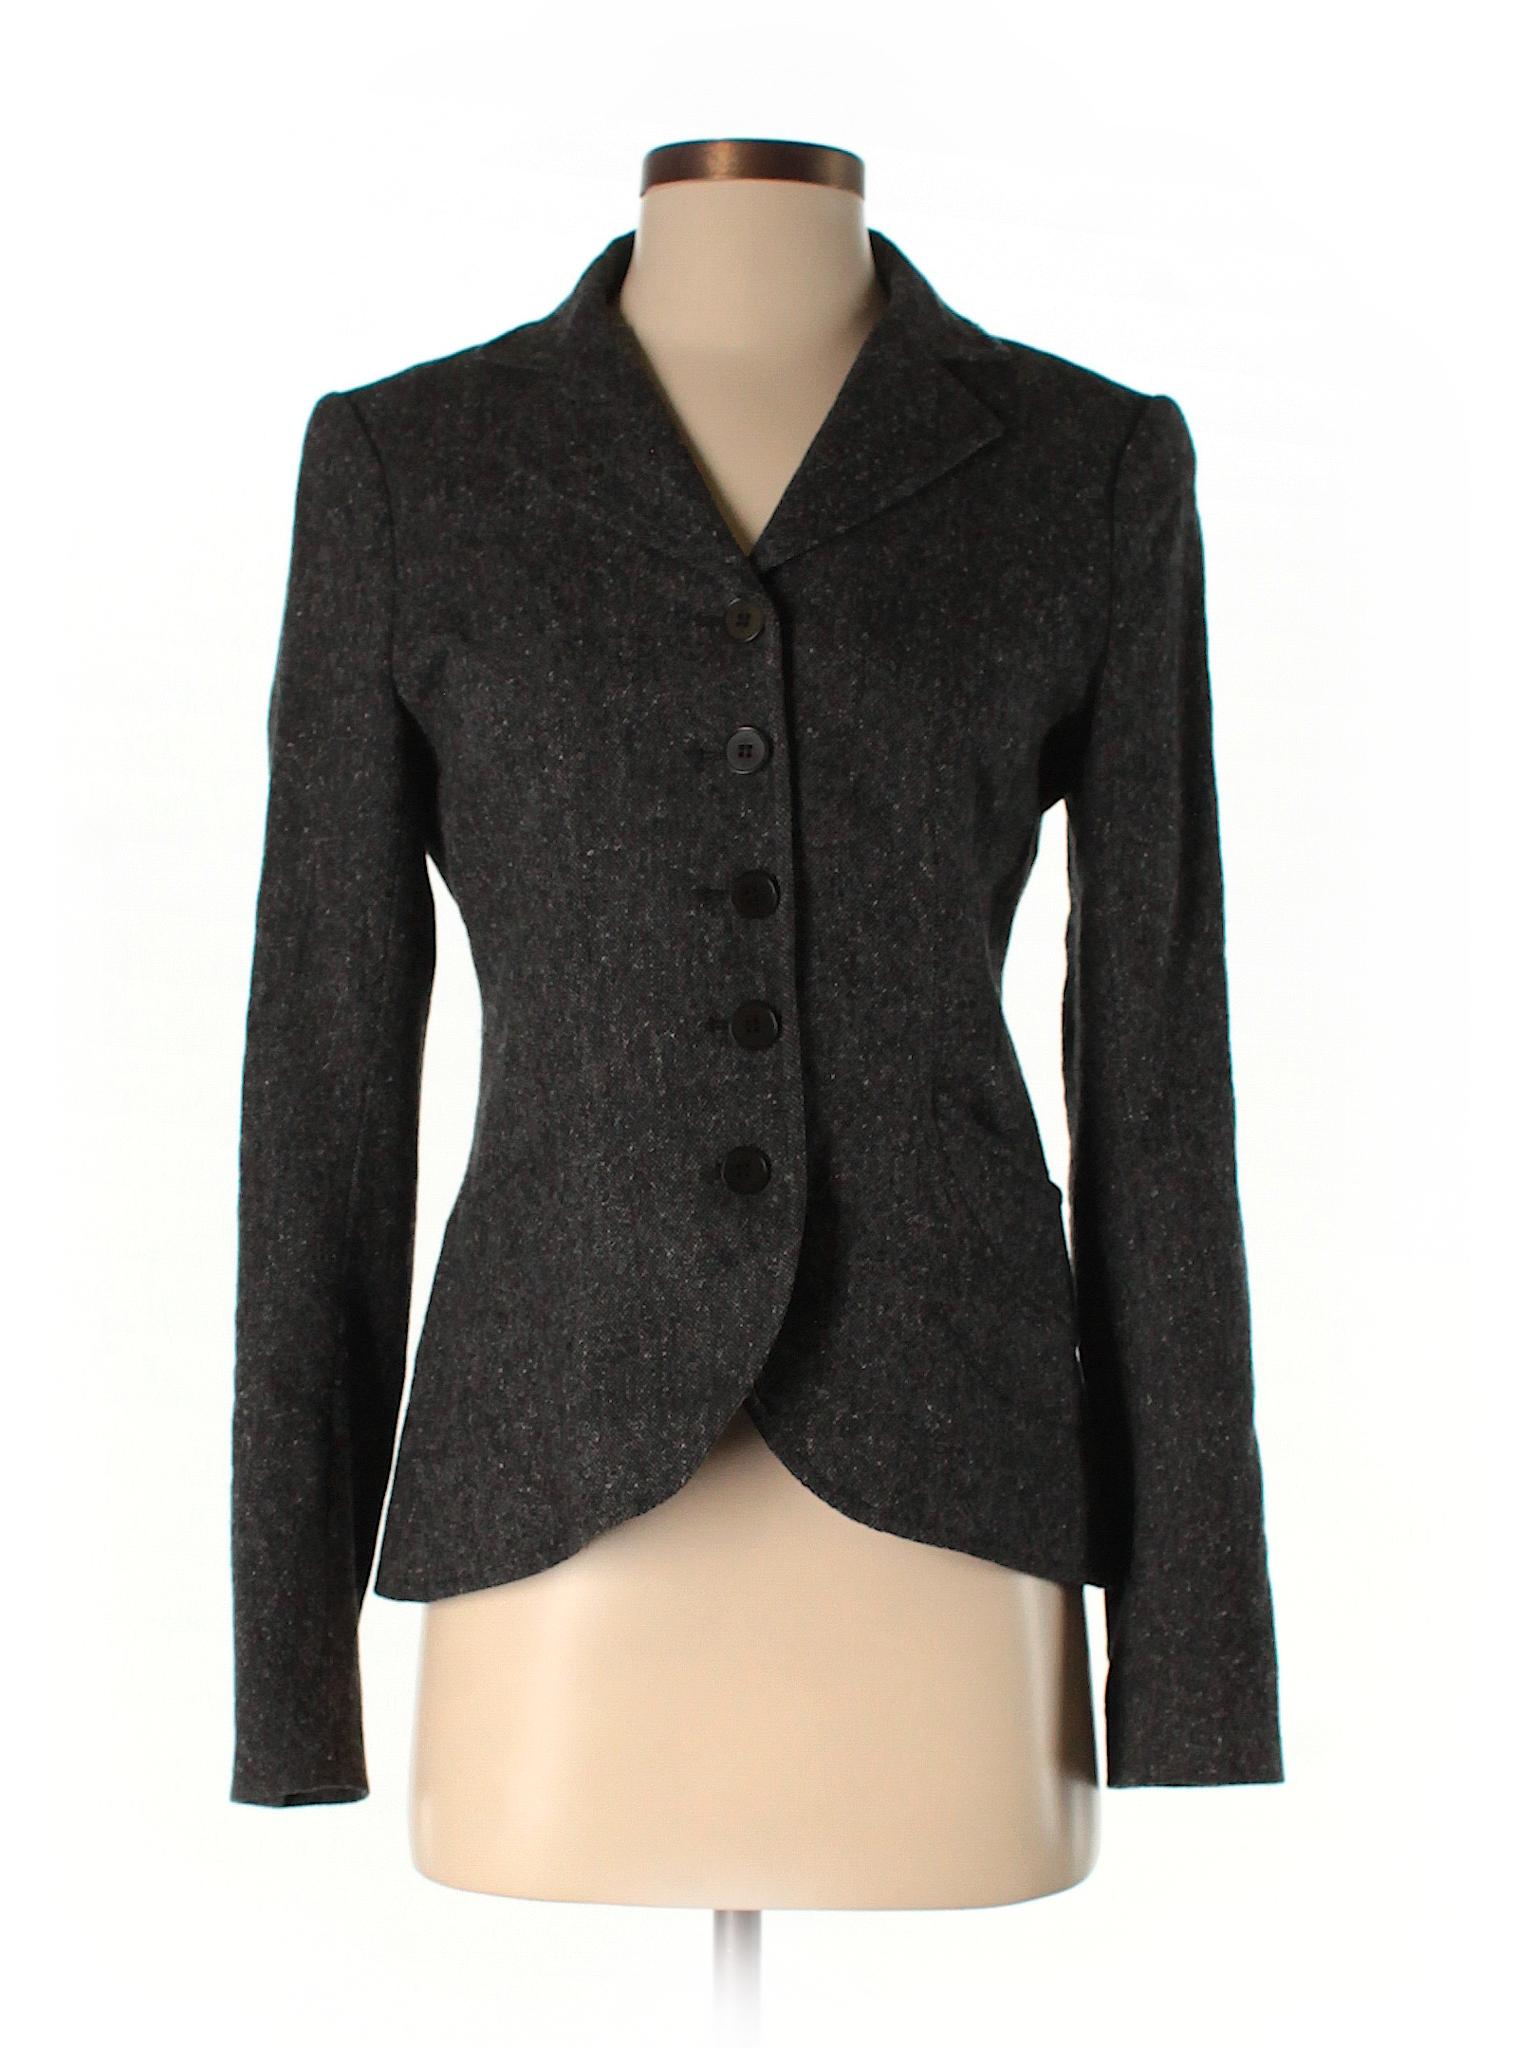 Blazer Boutique Wool Boutique Theory leisure leisure 56wqXT0Wq